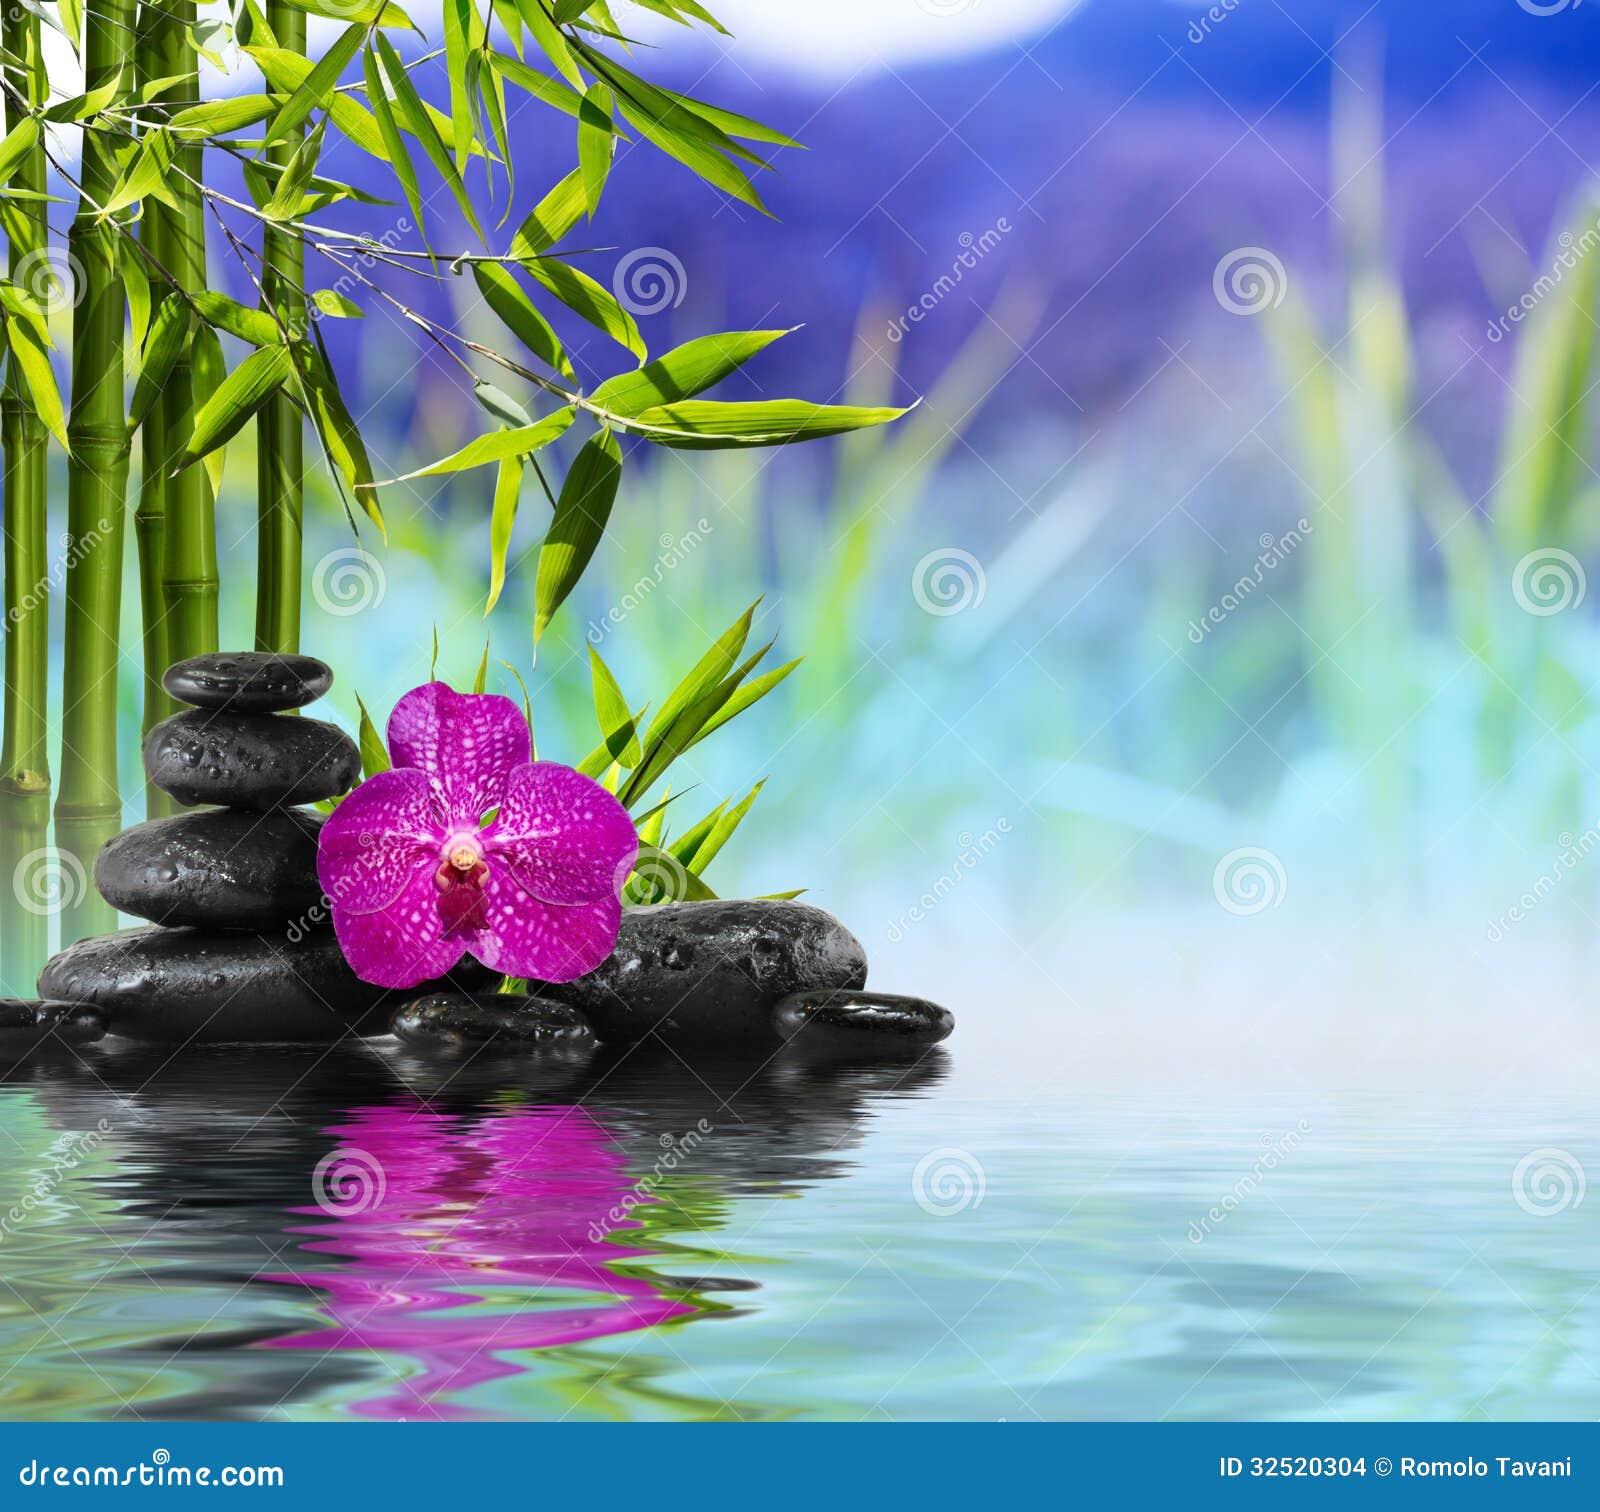 Purper Orchidee, Stenen en Bamboe op het water